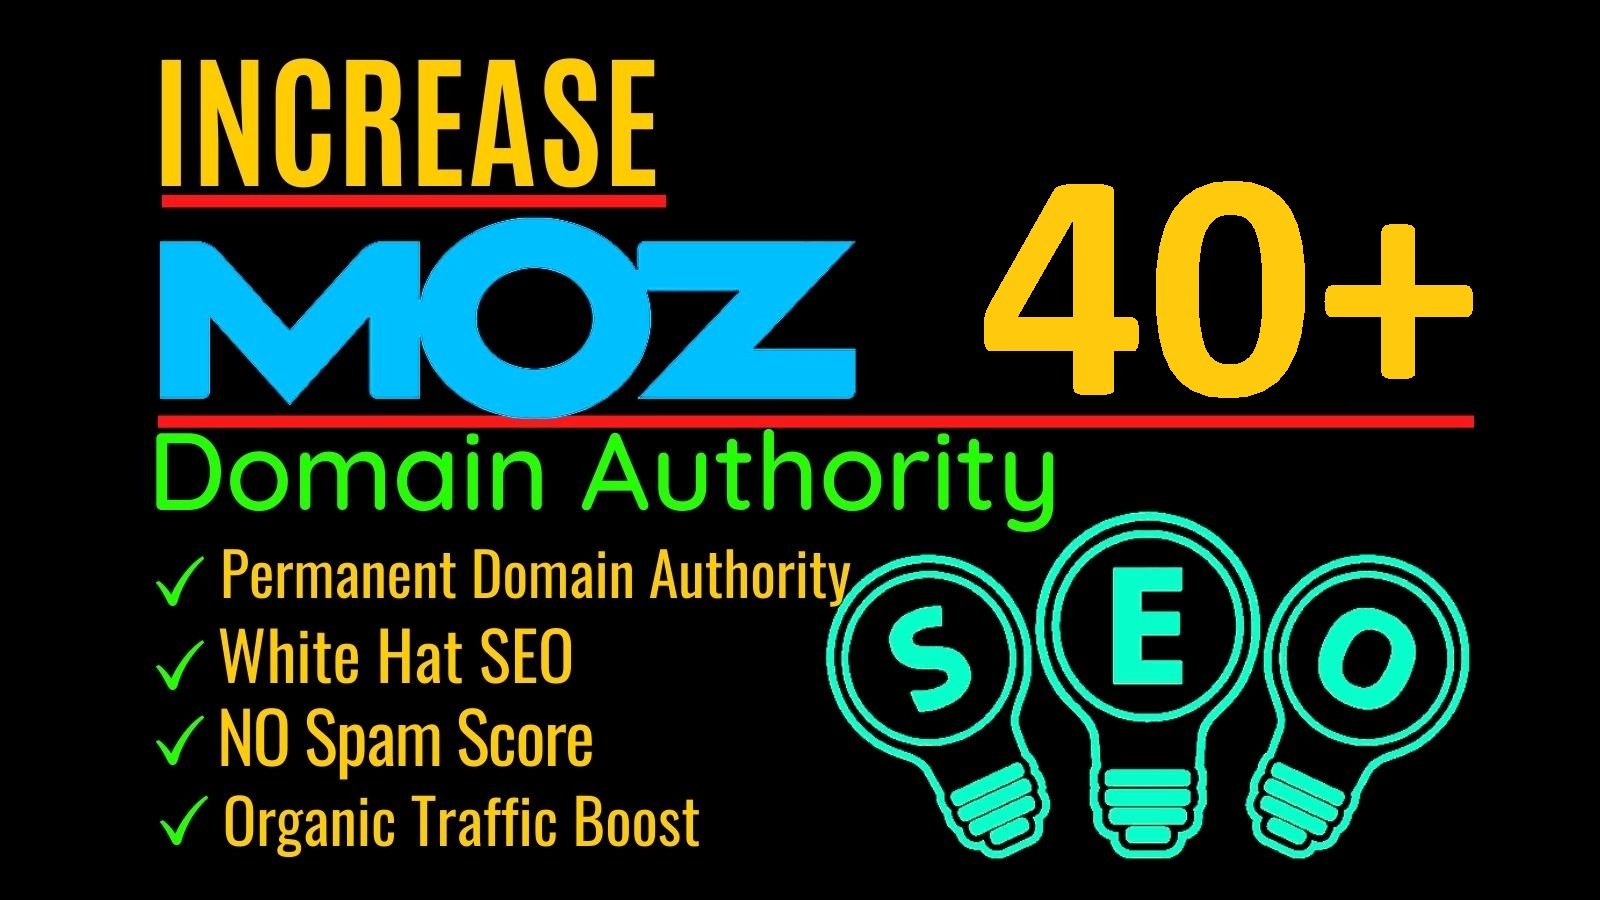 increase moz da domain authority up to 40 plus